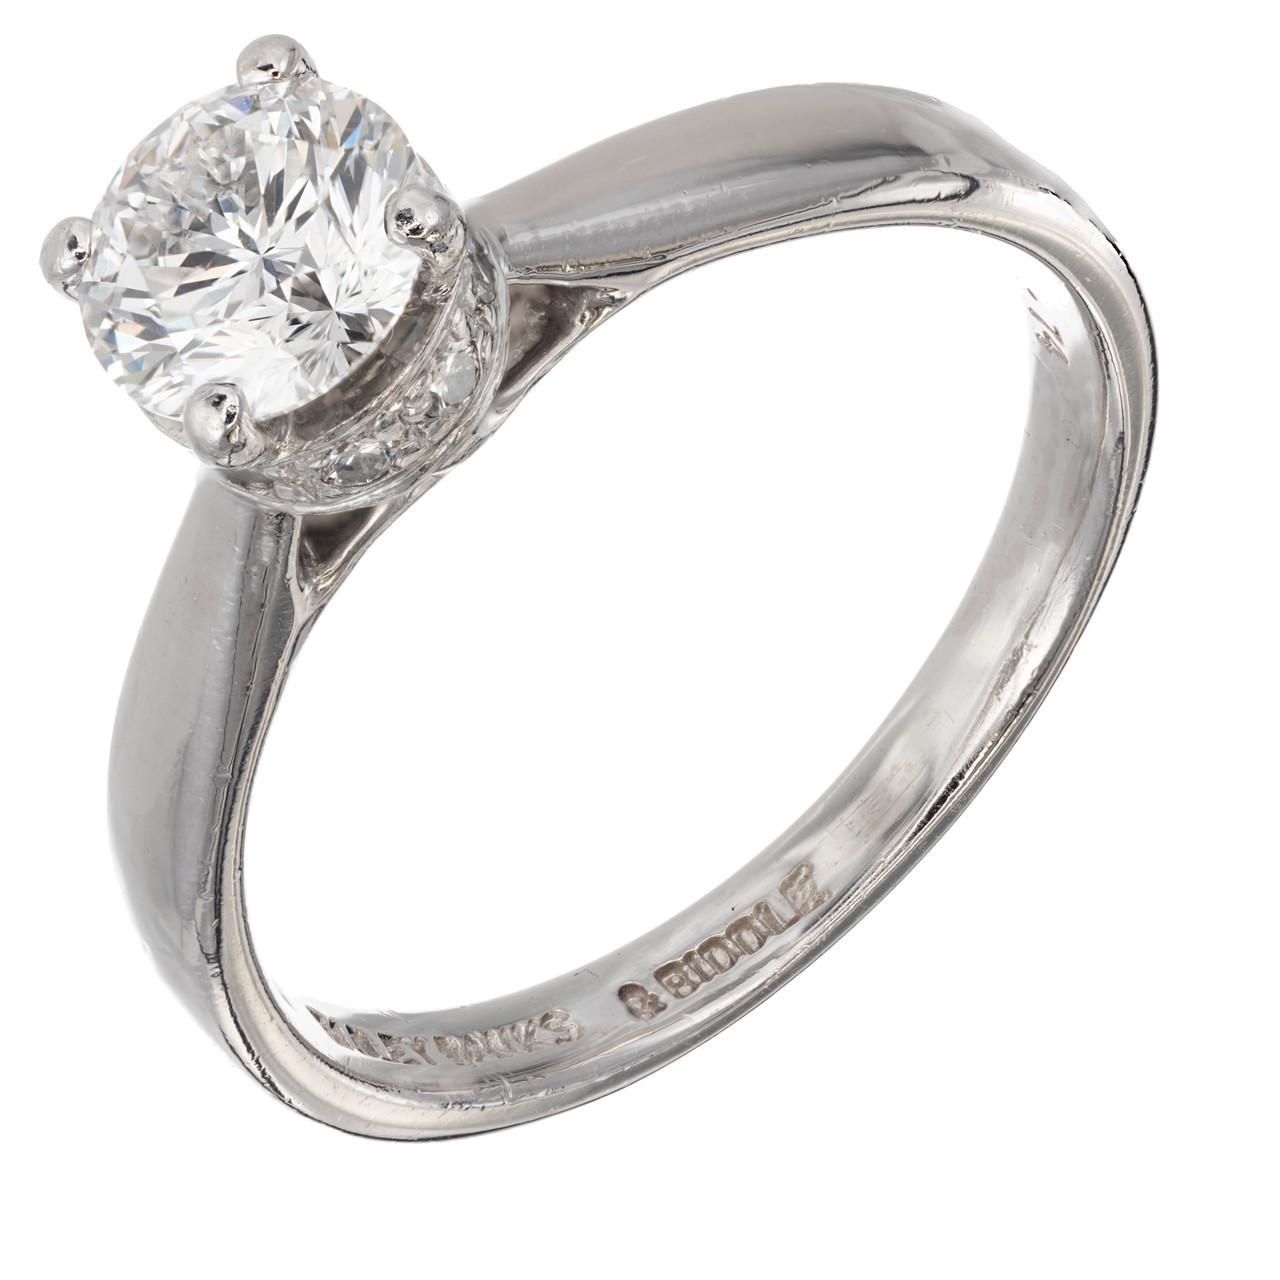 Bailey Banks Biddle 74 Carat Diamond Solitaire Platinum Engagement Ring Petersuchyjewelers